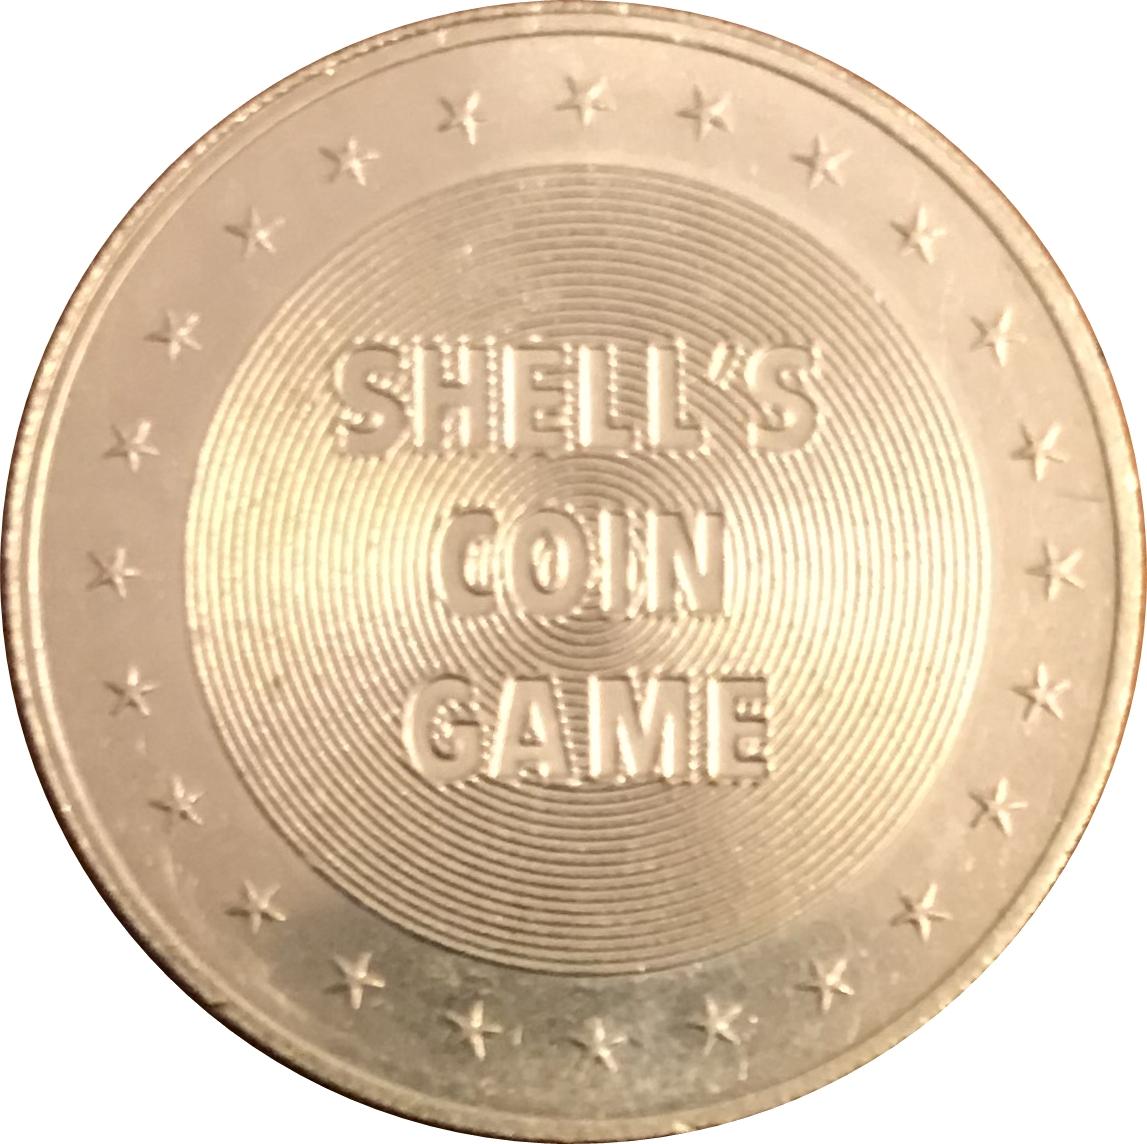 Maine Georgia State of Union Aluminum Shell Oil Coin